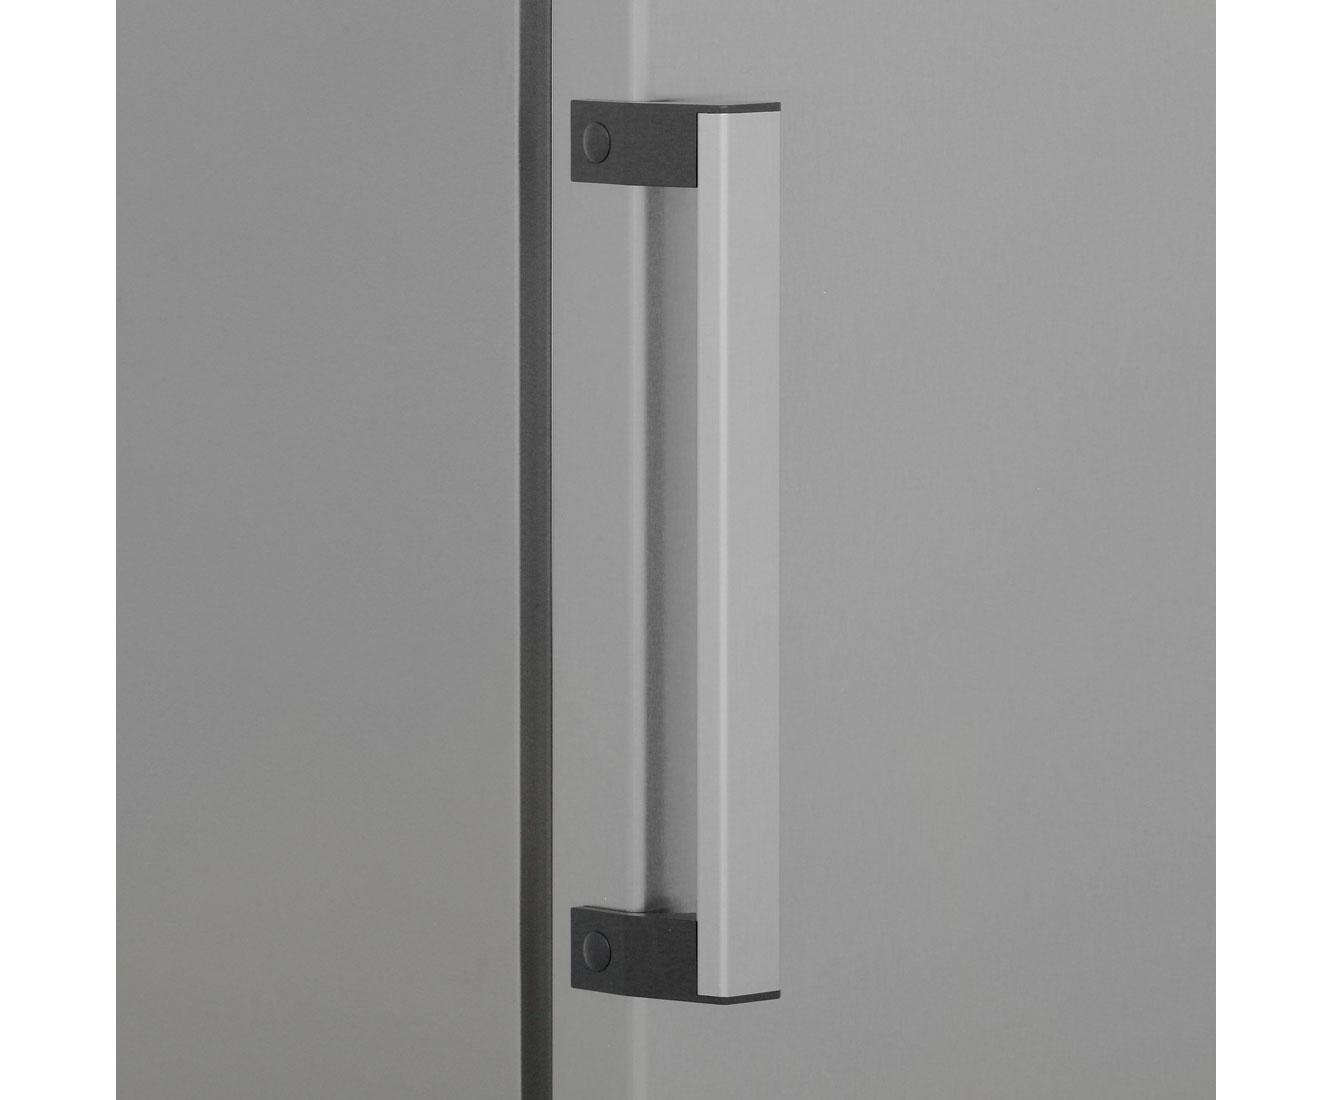 Gorenje Kühlschrank Edelstahl : Maße kühlschrank freistehend gorenje r6152brd kühlschrank